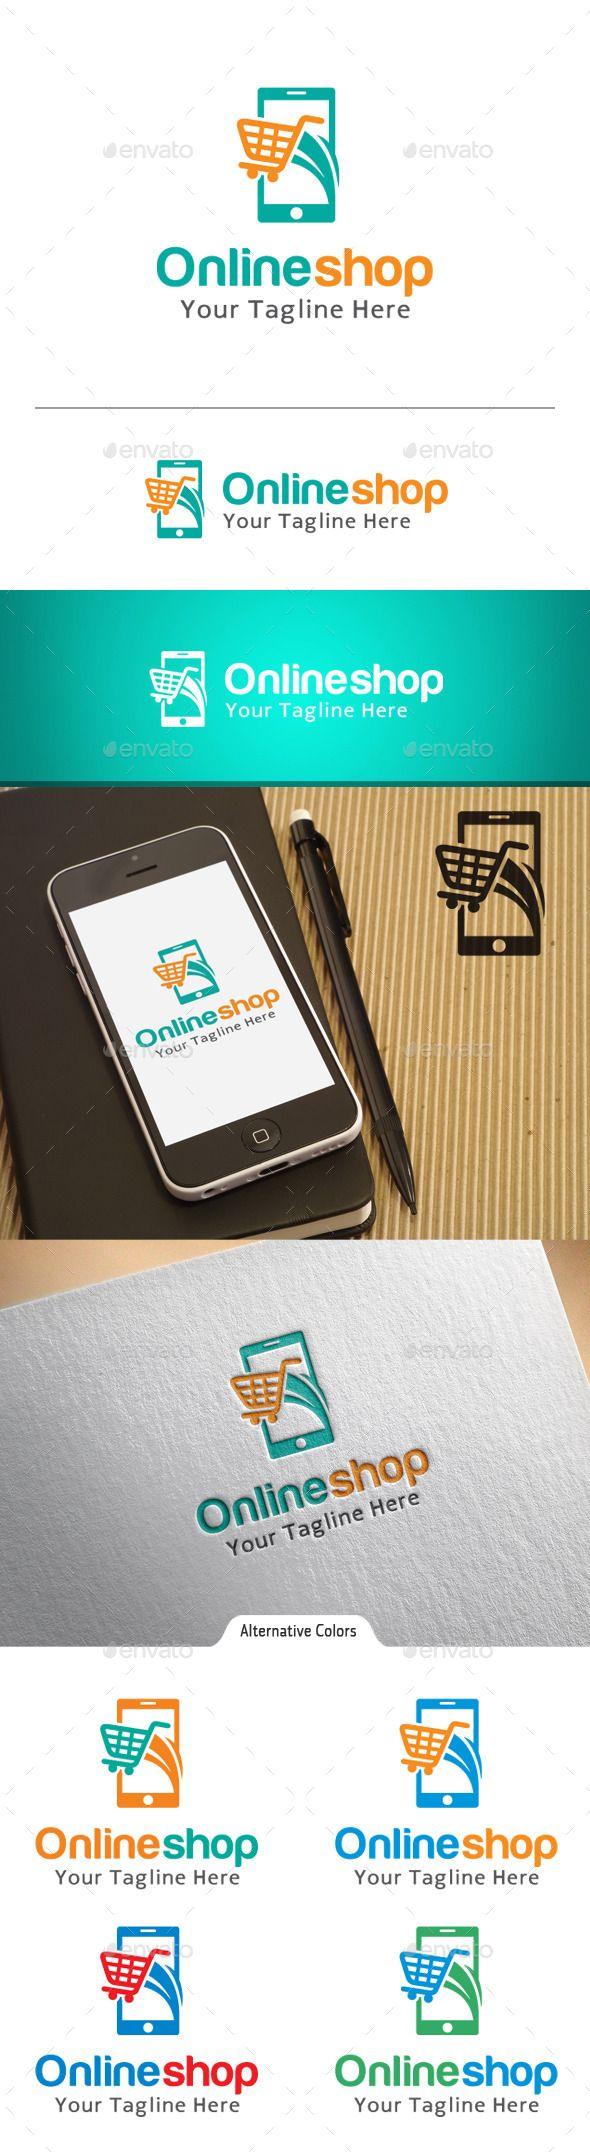 Online Shop  - Logo Design Template Vector #logotype Download it here: http://graphicriver.net/item/online-shop-logo/10863207?s_rank=999?ref=nexion